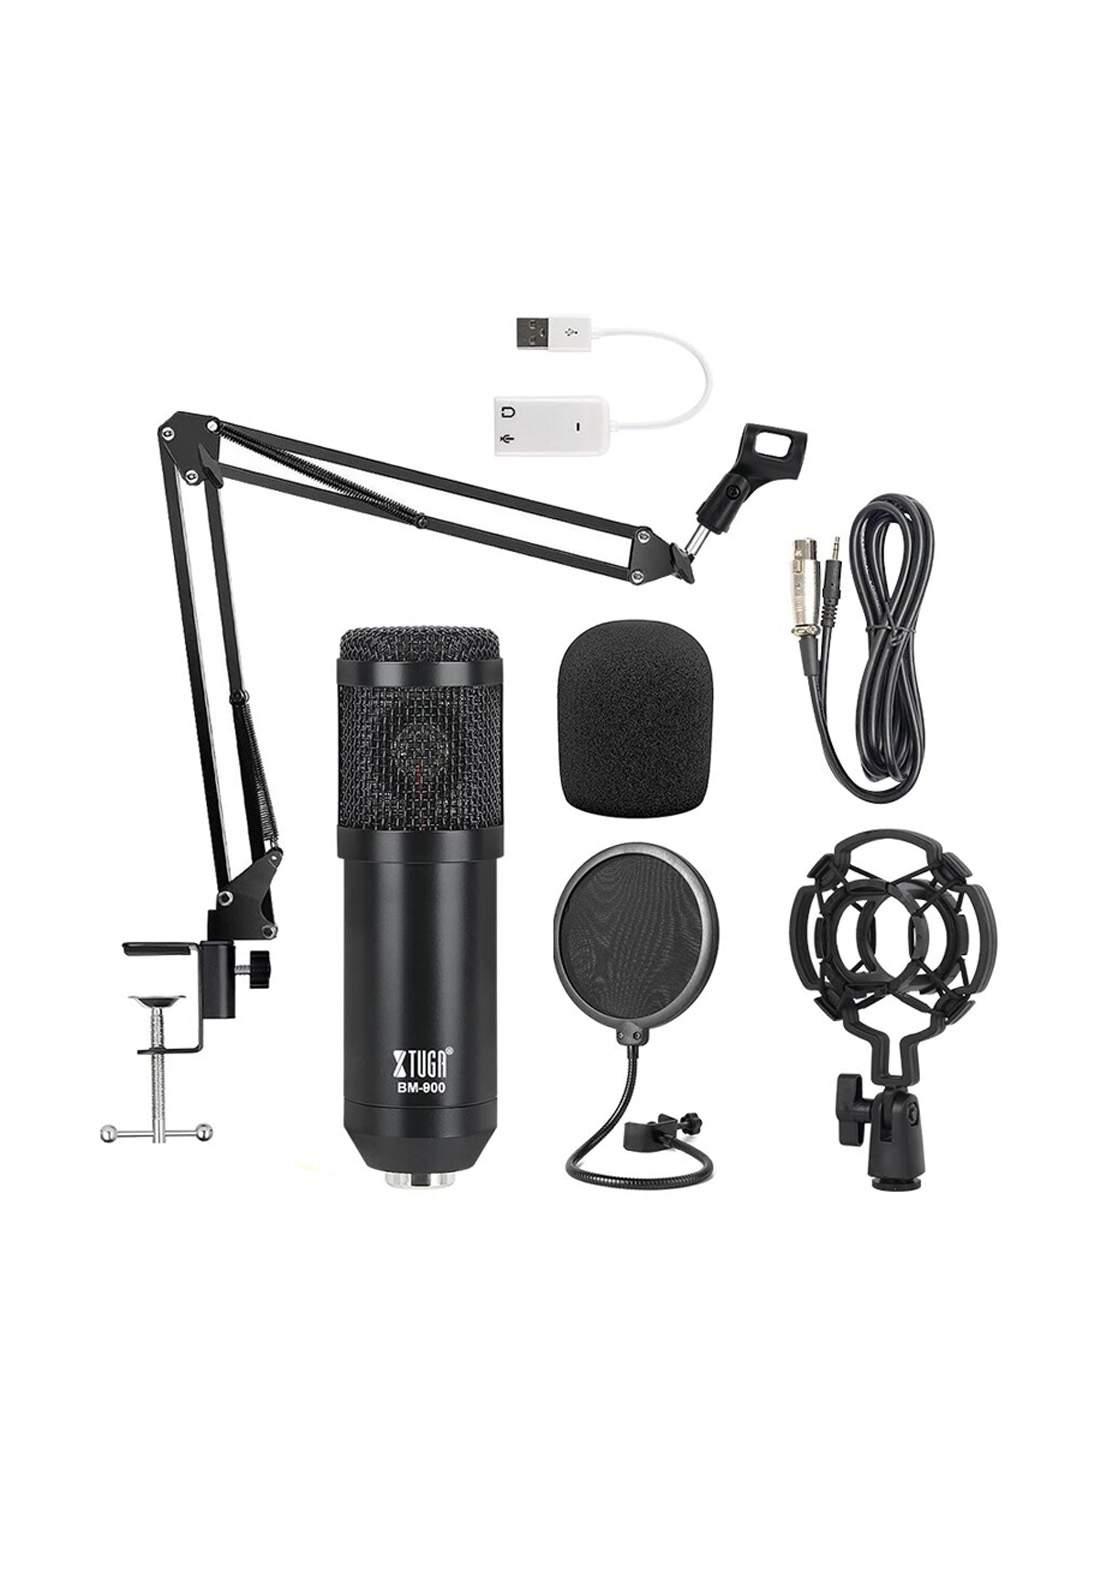 XTUGA BM800 Professional Condenser Microphone - Black مايكروفون